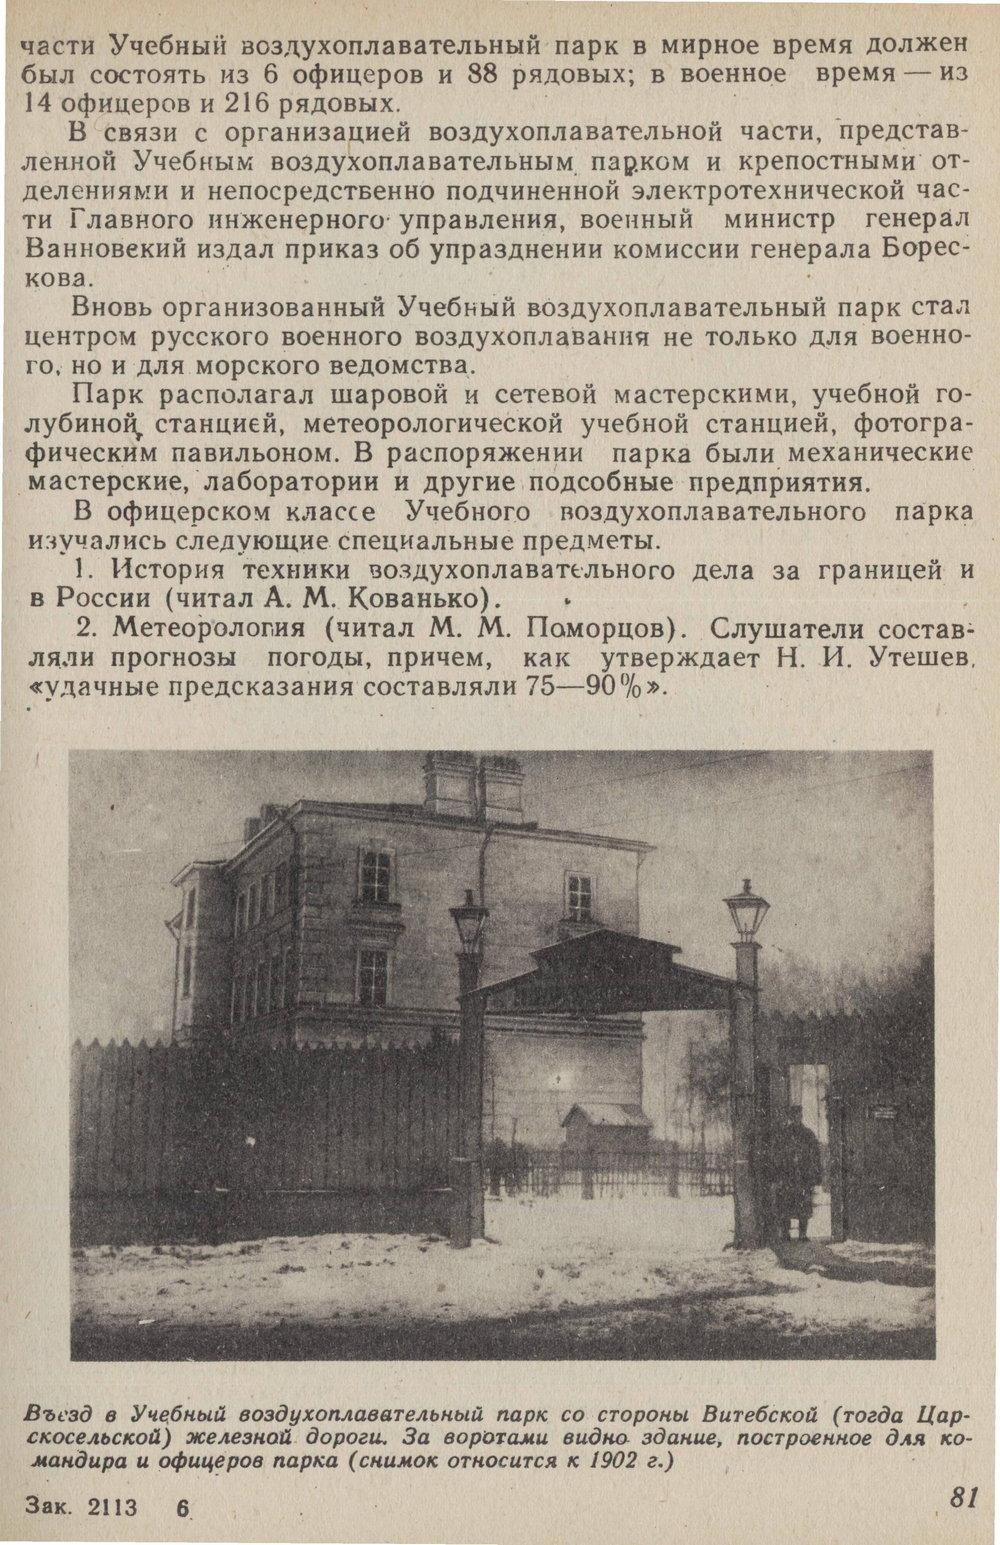 http://images.vfl.ru/ii/1367587561/e3524ed2/2270404.jpg